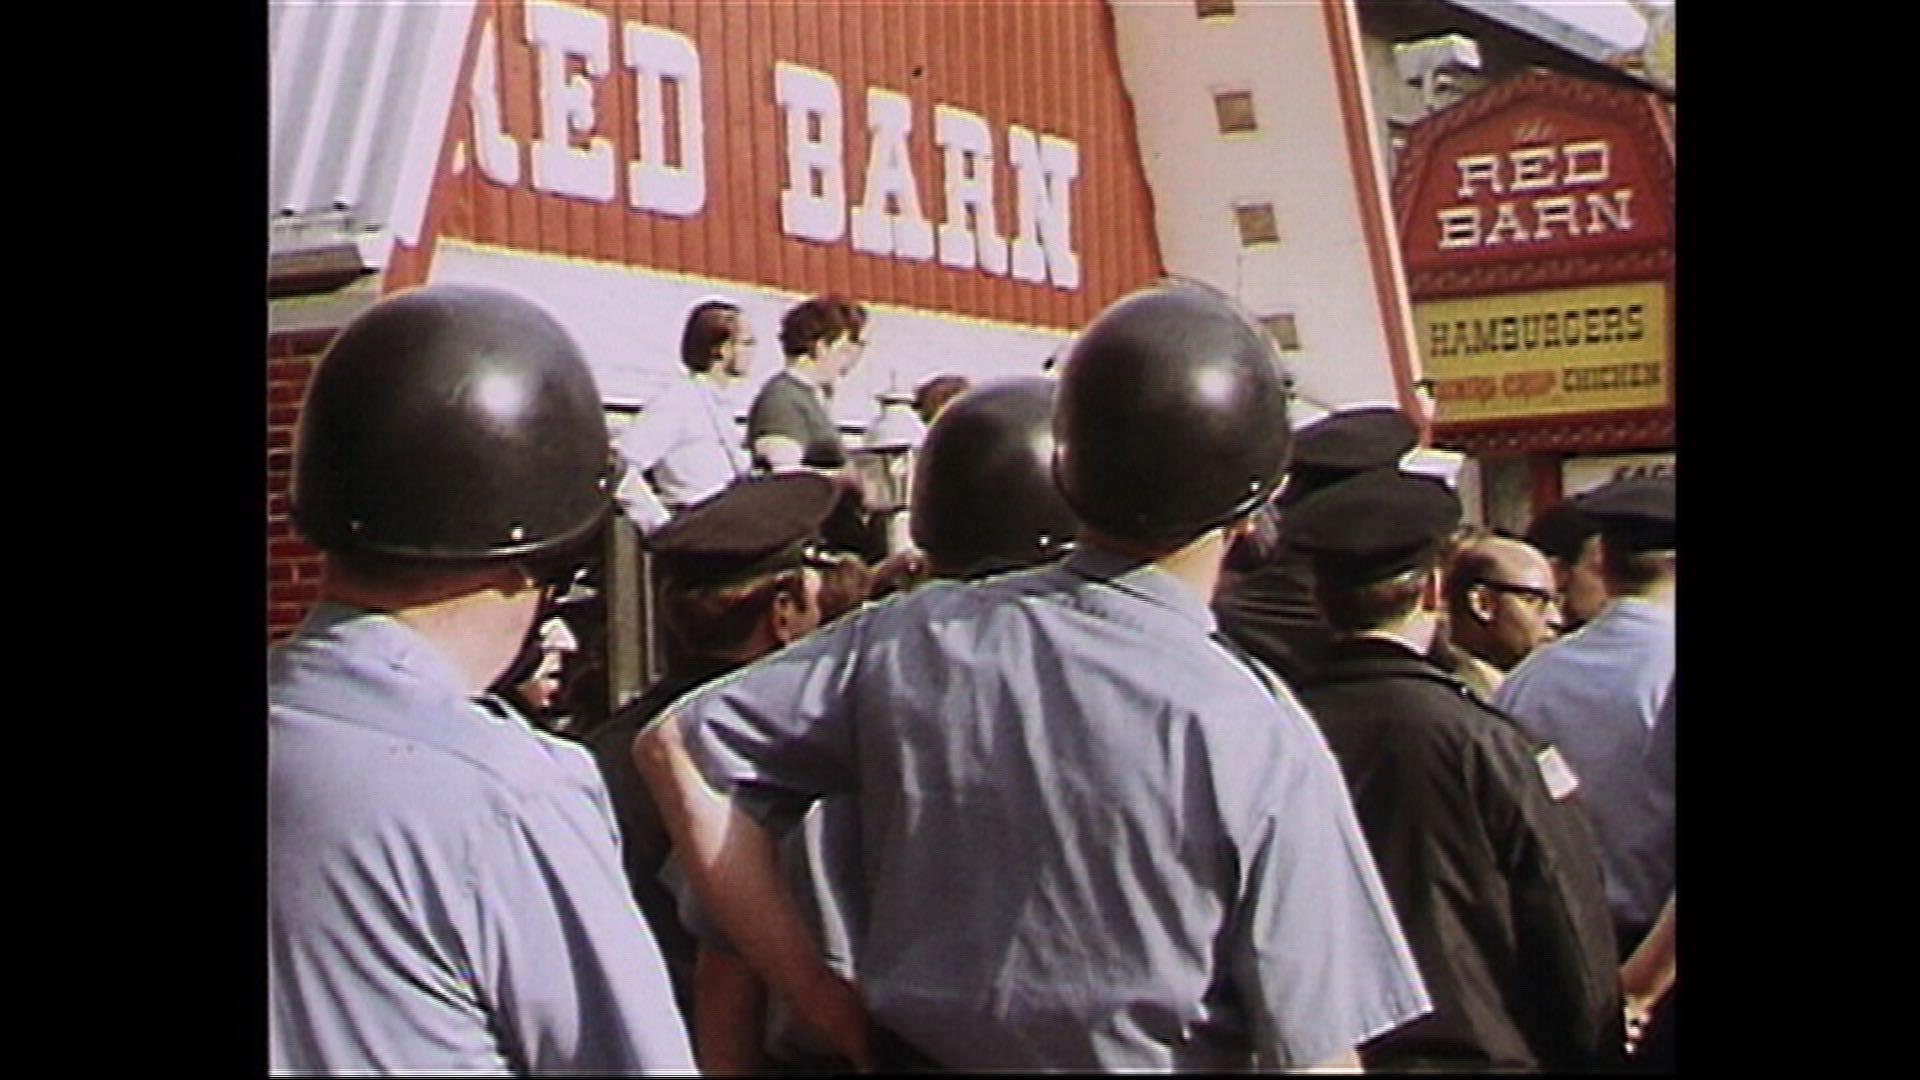 Red Barn Protest - Allan Spear at Oak St..jpg